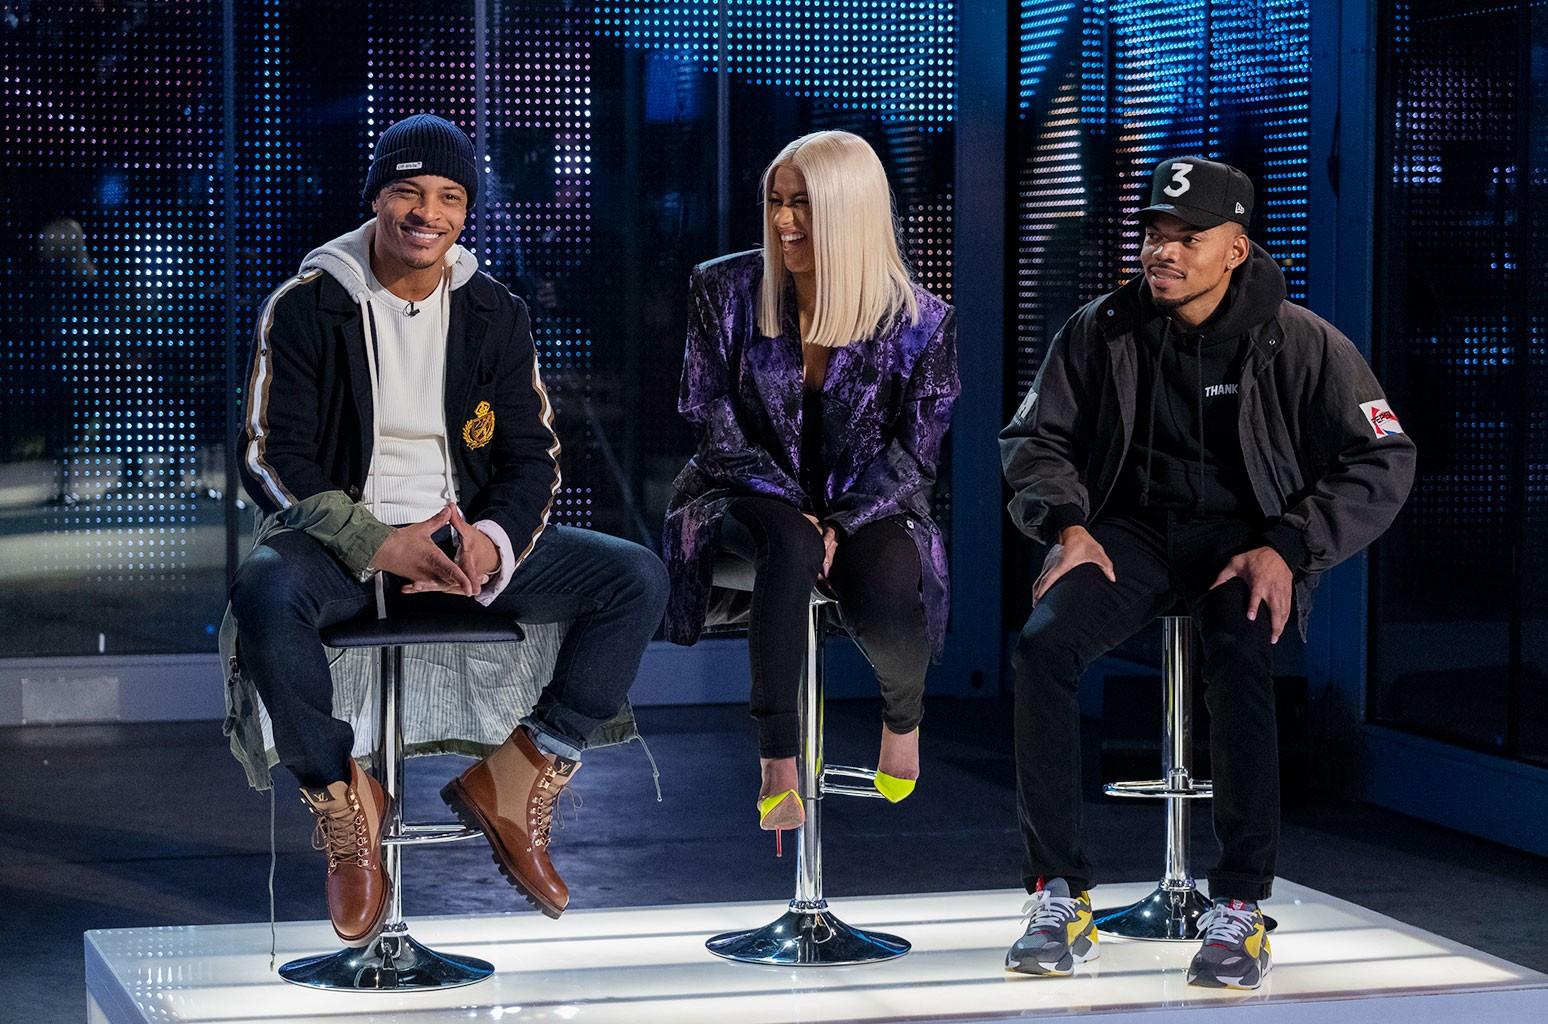 T.I., Cardi B and Chance The Rapper